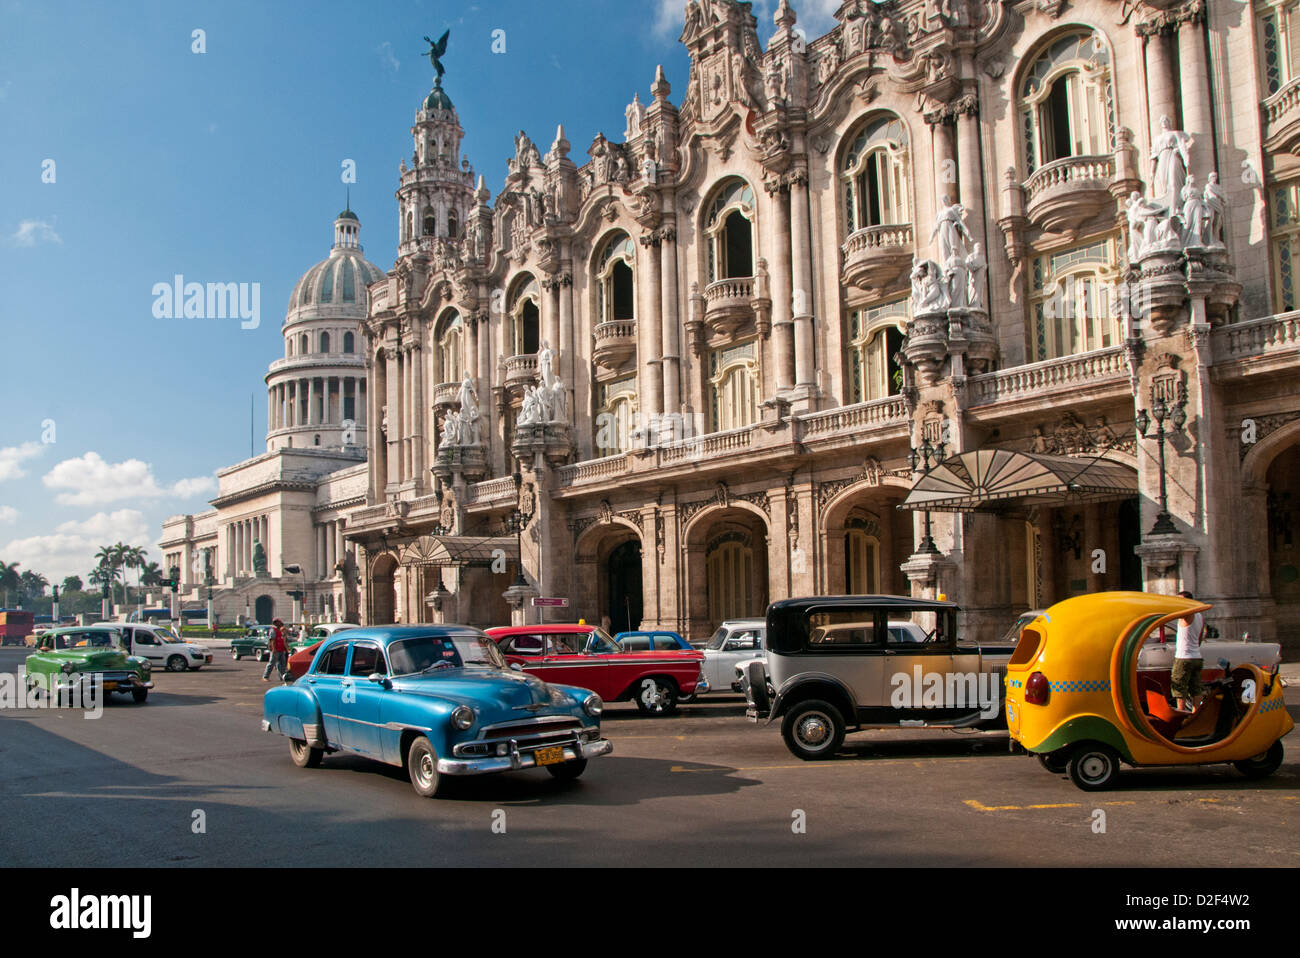 Klassische 50er Jahre amerikanische Autos Passing The Capitolio Gebäude & Gran Teatro De La Habana, Paseo Stockbild